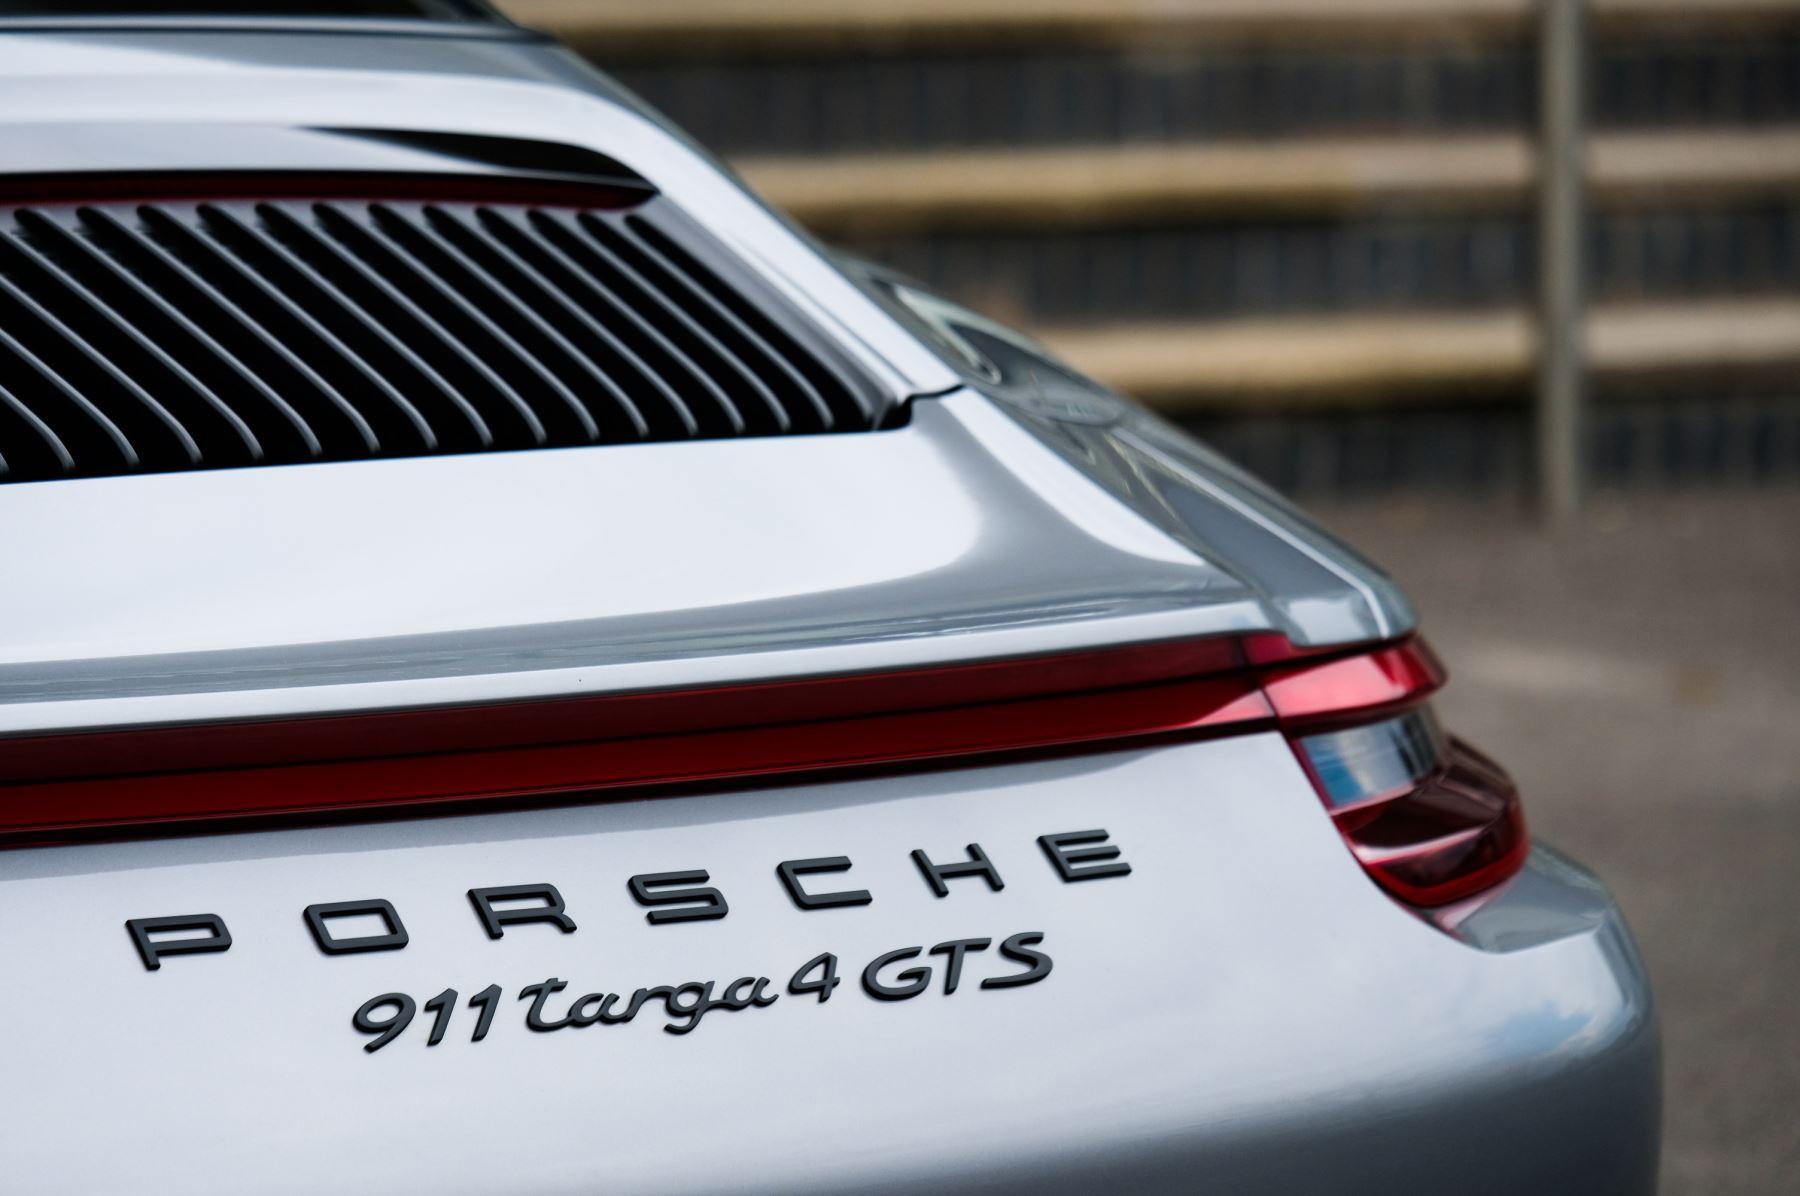 Porsche 911 TARGA 4 GTS - PDK - SPORT DESIGN PACKAGE - GTS INTERIOR PACKAGE image 12